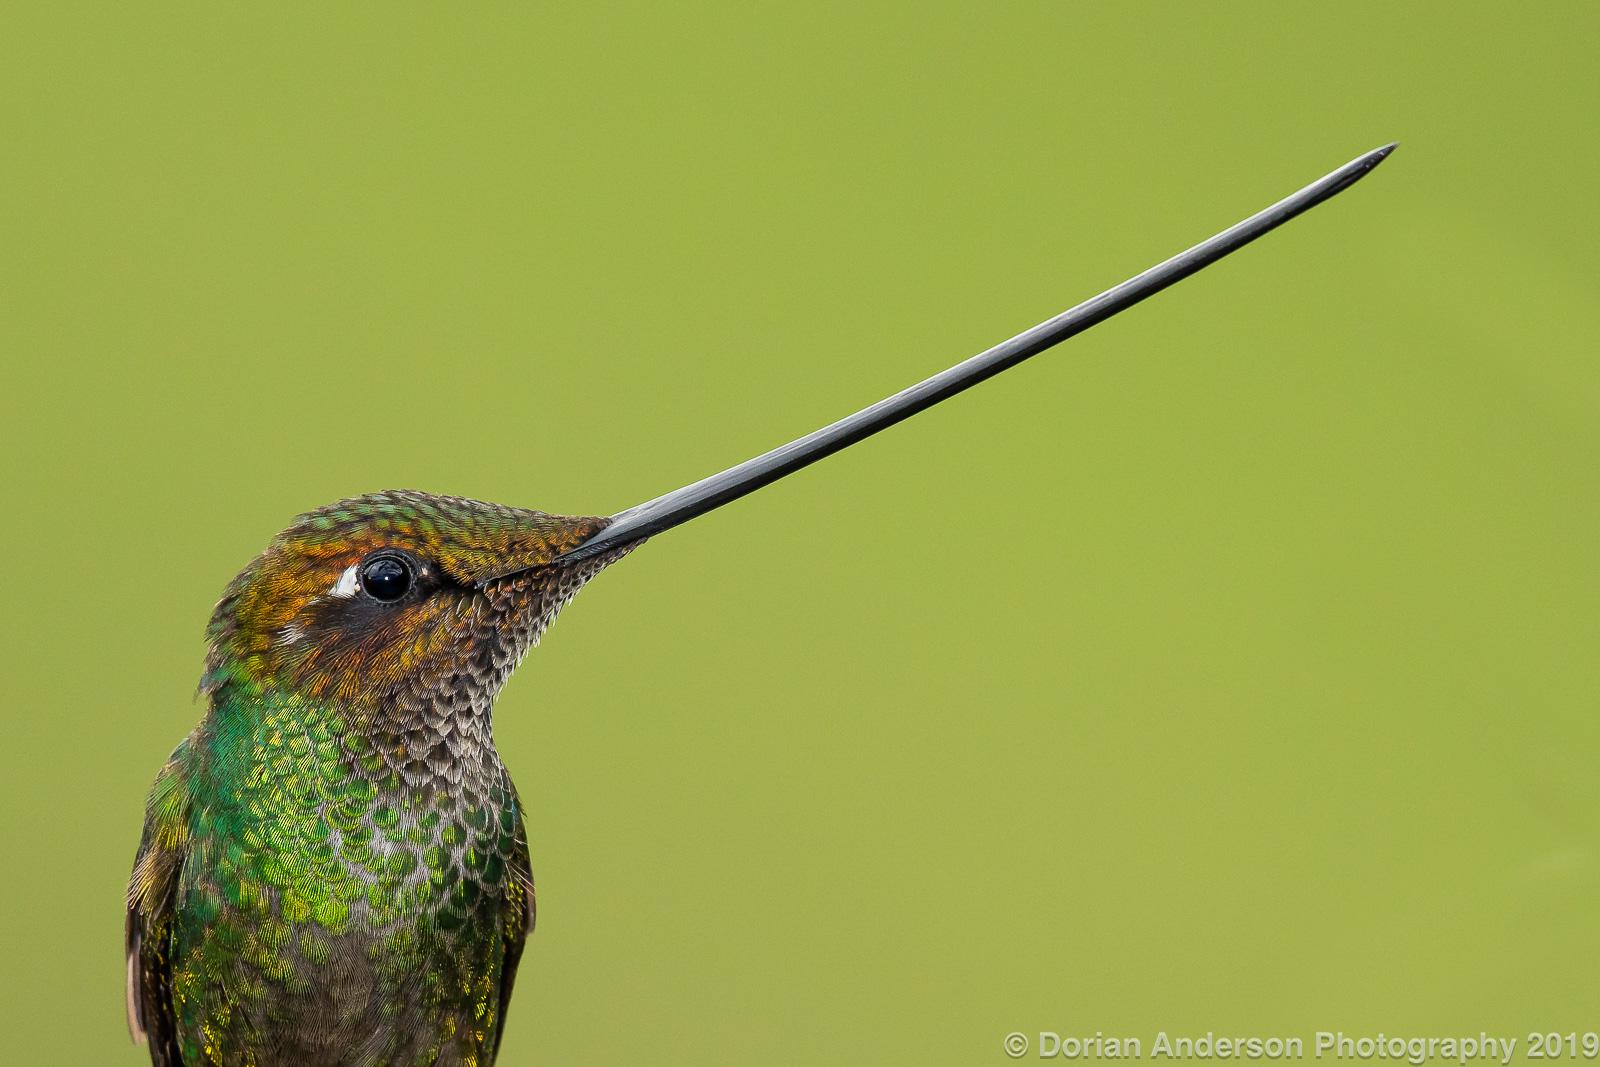 Name:  sword-billed hummingbird head 070319.jpg Views: 167 Size:  491.1 KB